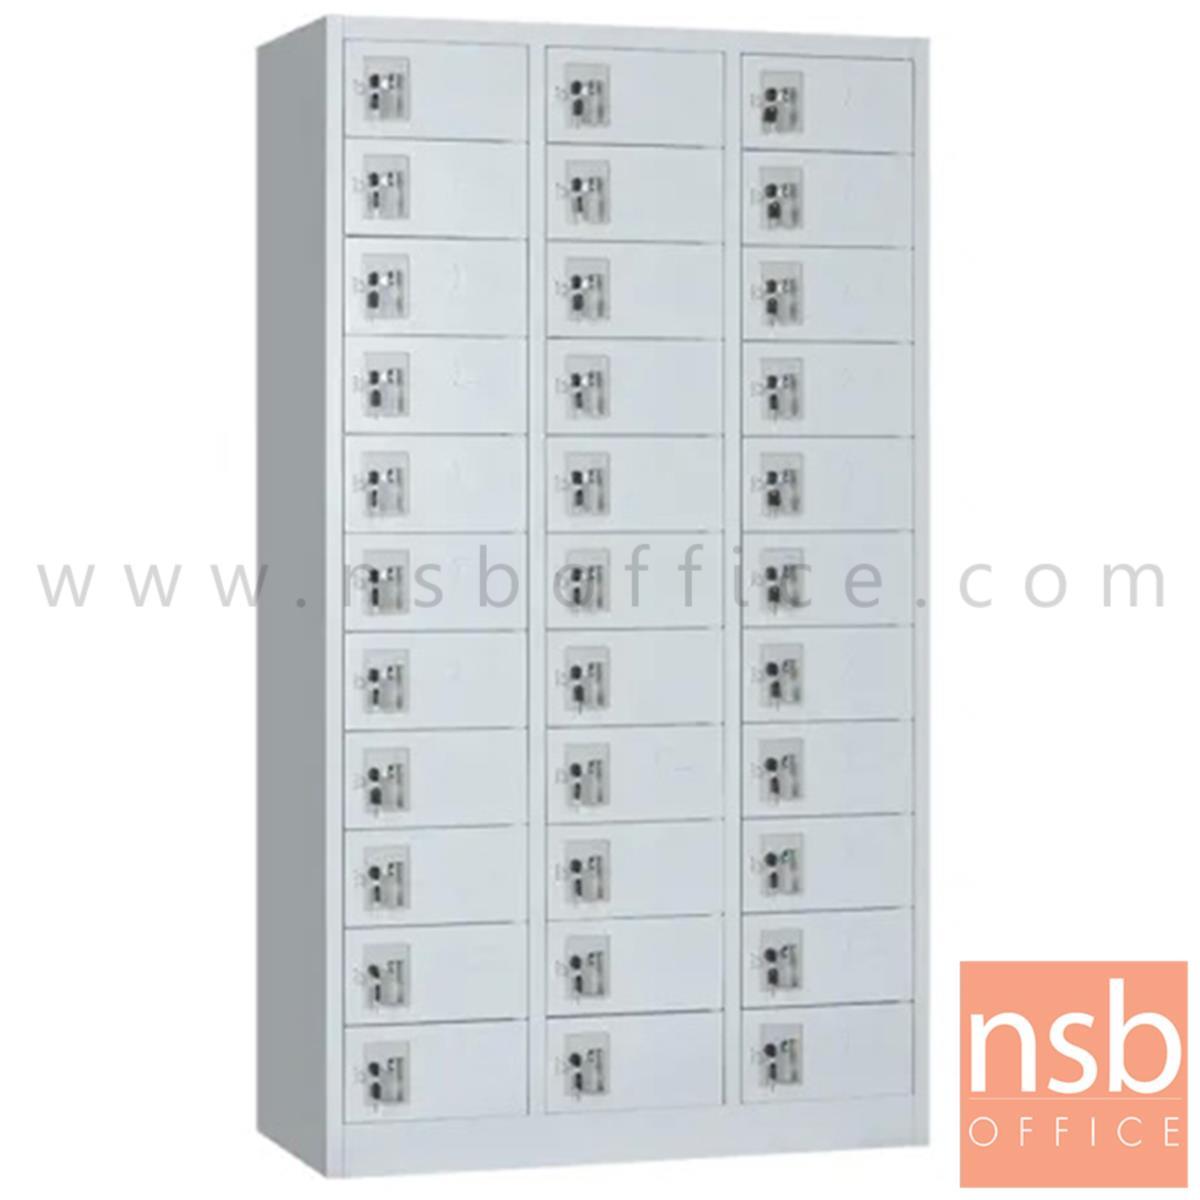 E03A037:ตู้ล็อกเกอร์เหล็ก 33 ประตู  รุ่น Estefan (เอสเตฟาน) ขนาด 94.5W cm. ระบบกุญแจล็อค